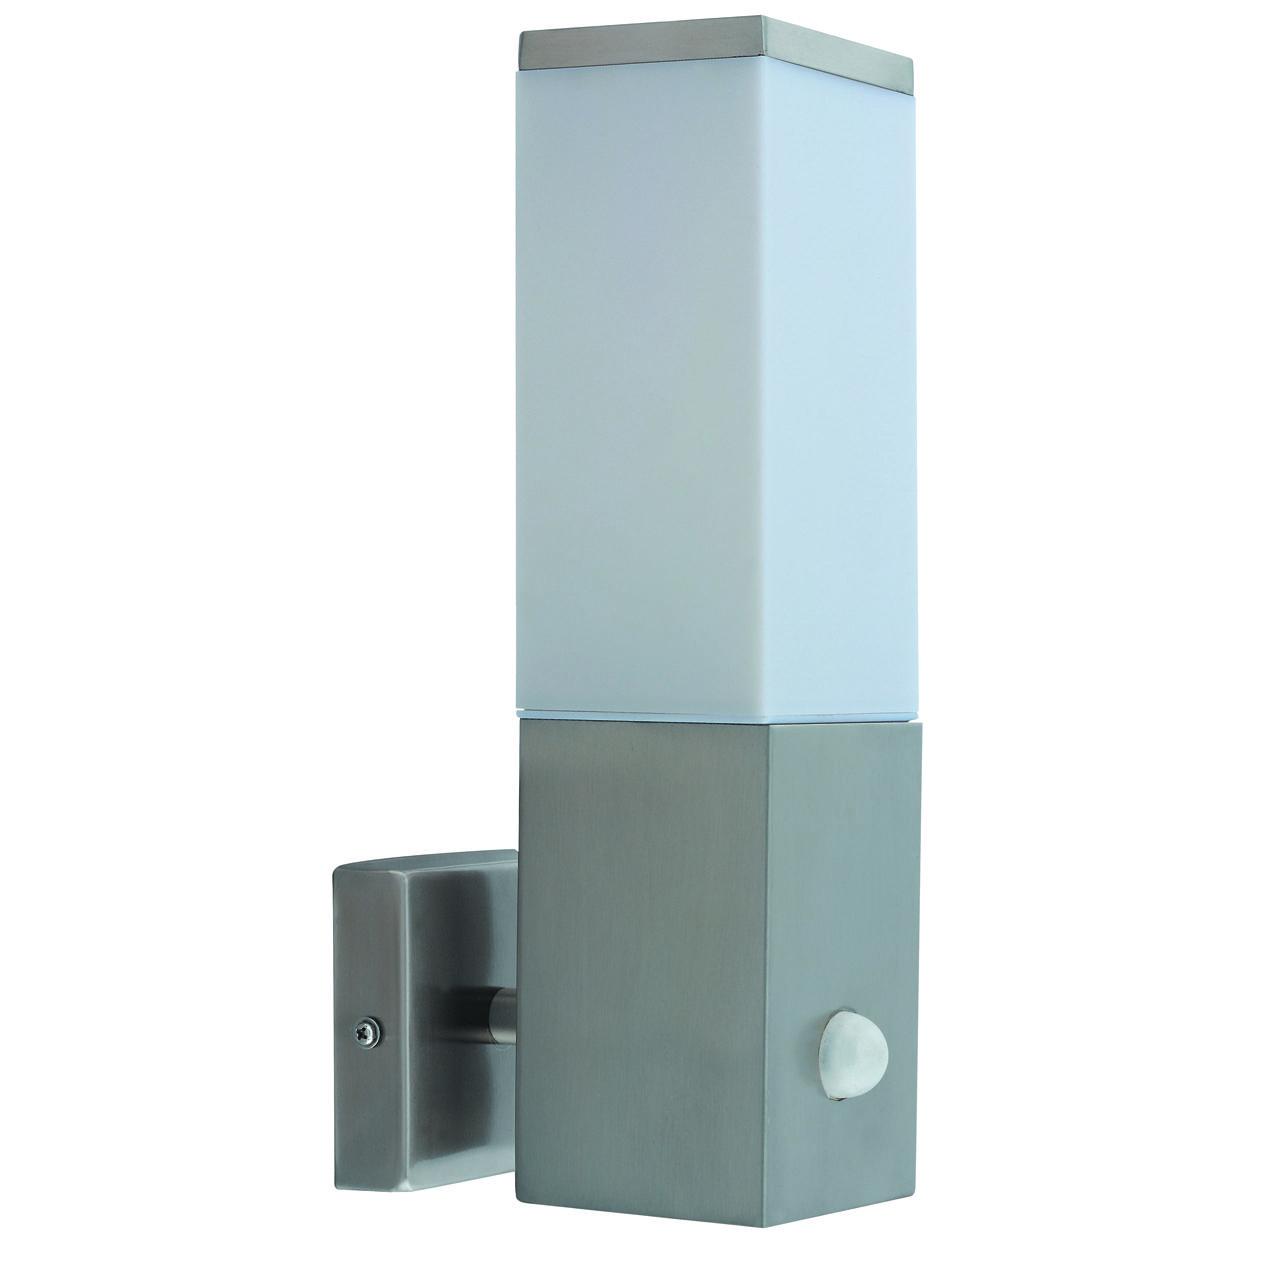 kabul pir stainless steel outdoor pir low energy wall light bulb